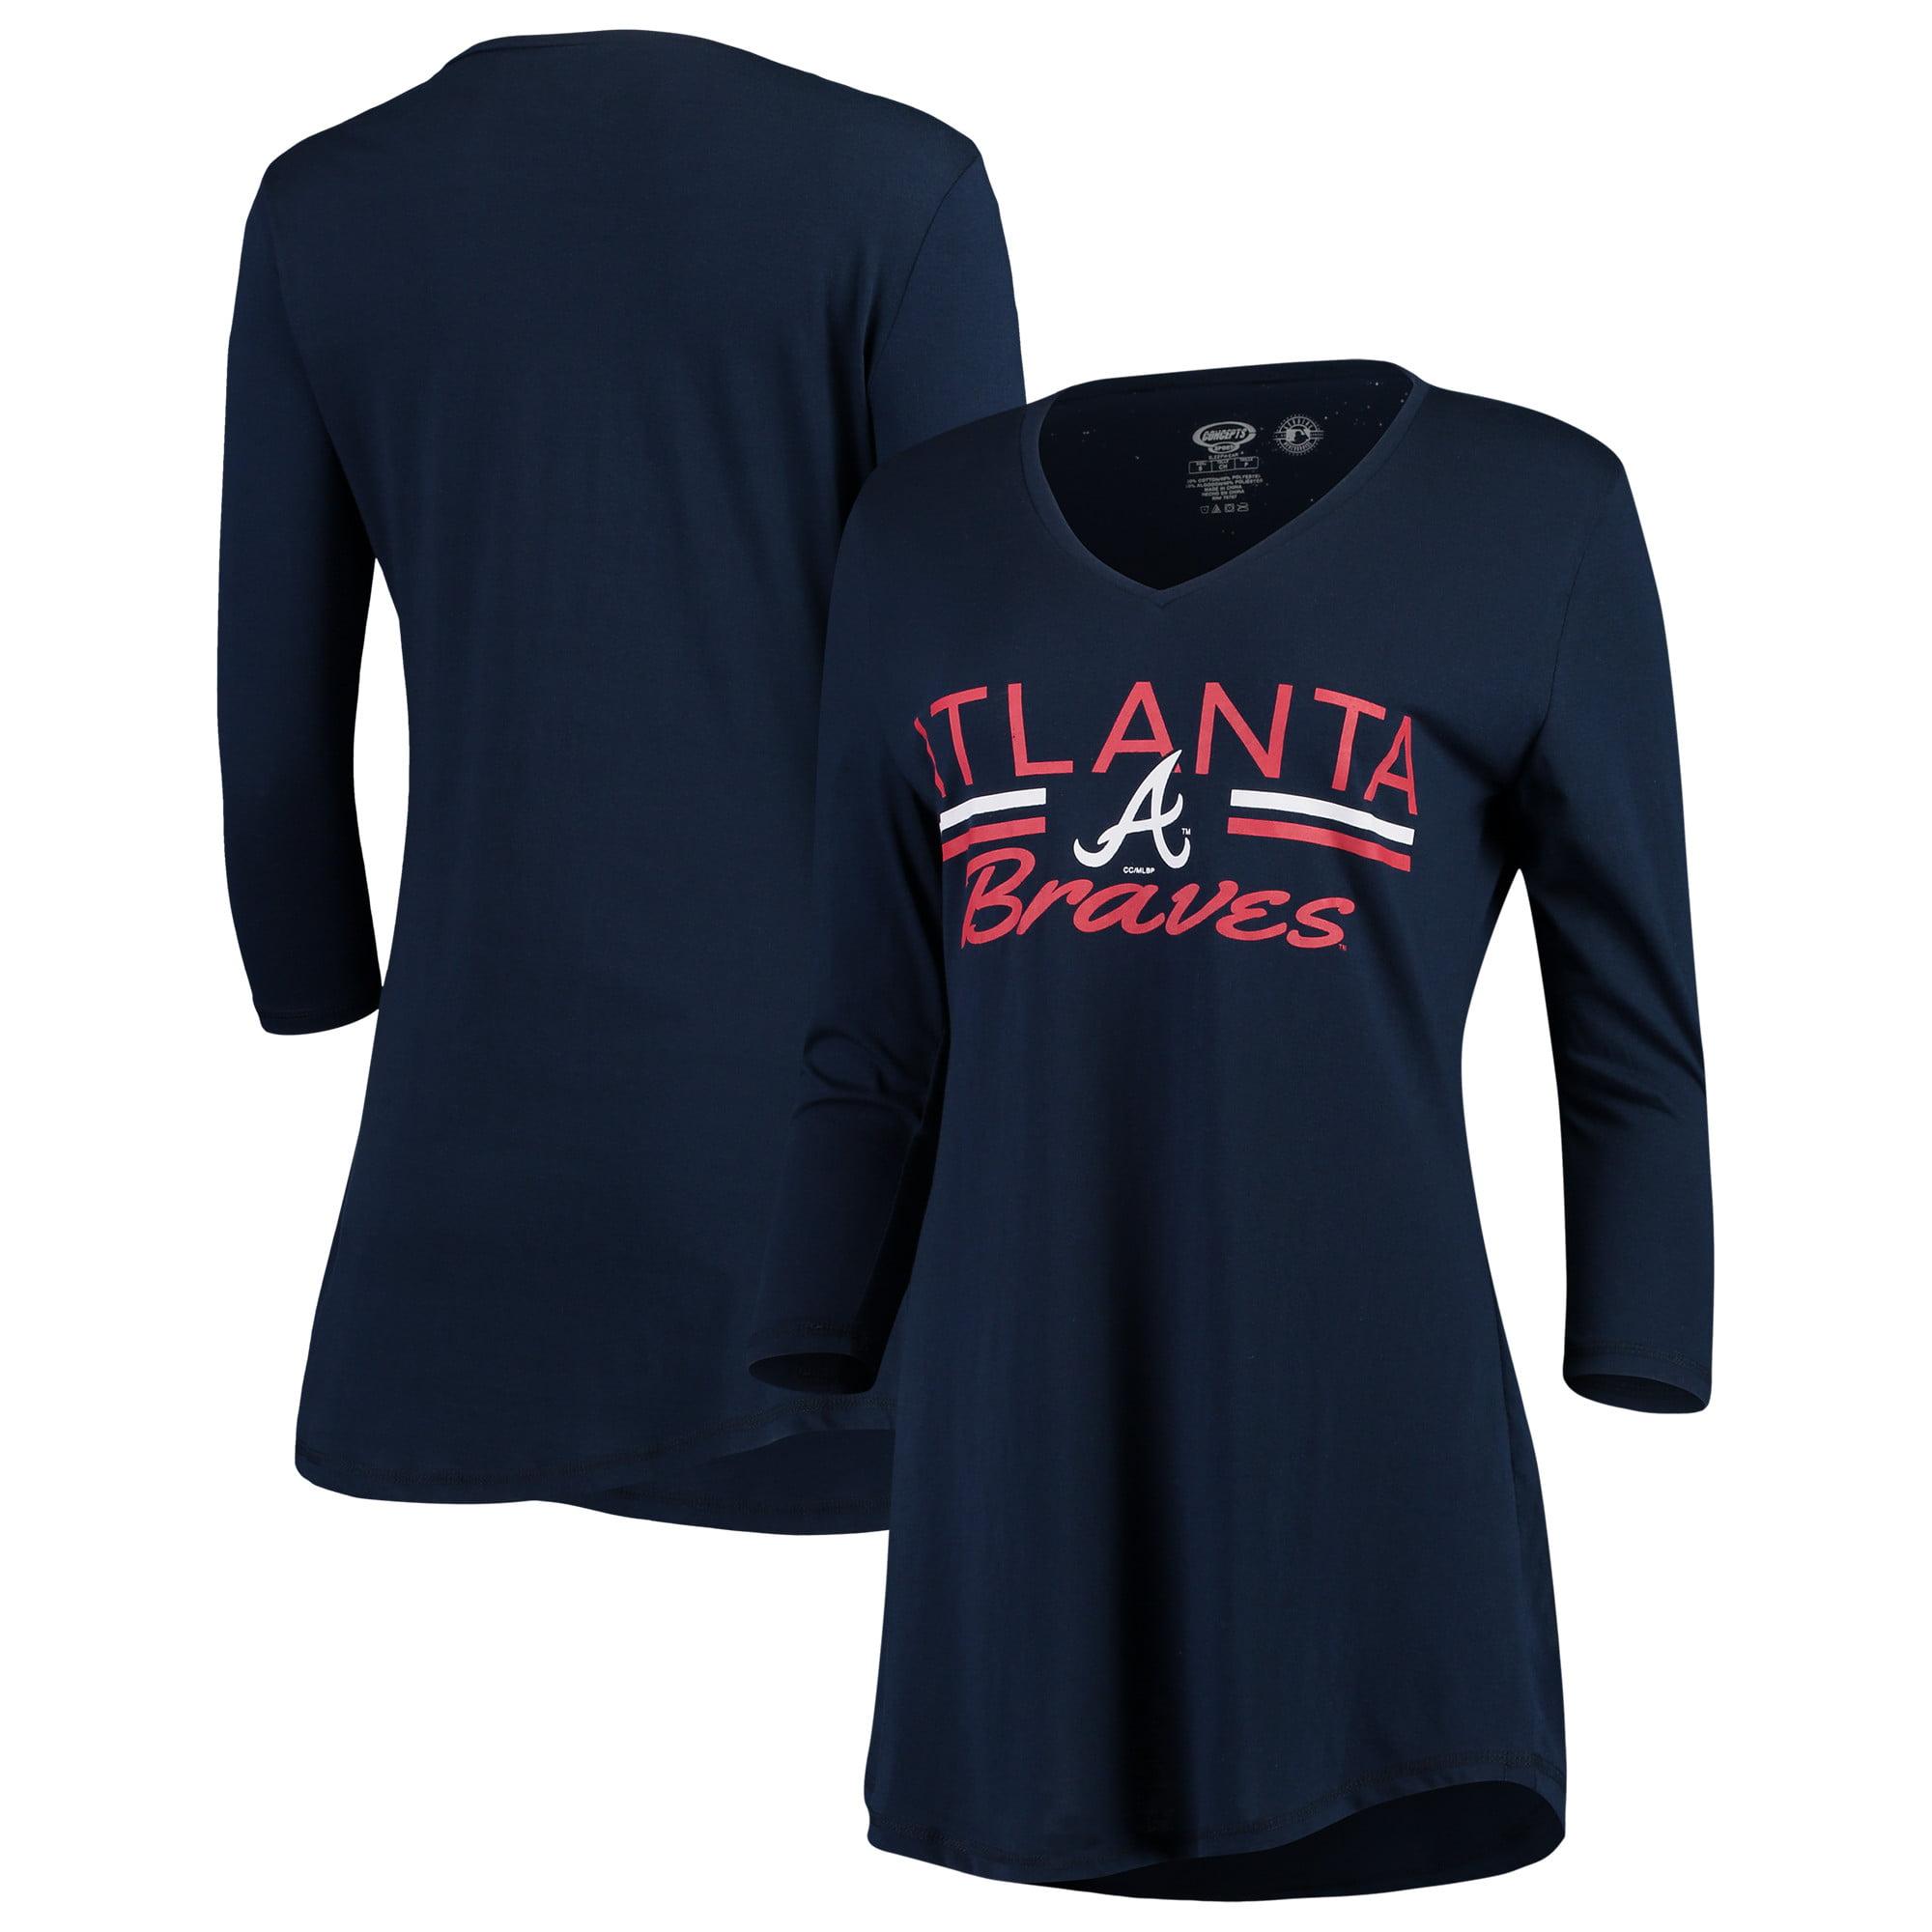 Atlanta Braves Concepts Sport Women's Duo V-Neck Nightshirt - Navy